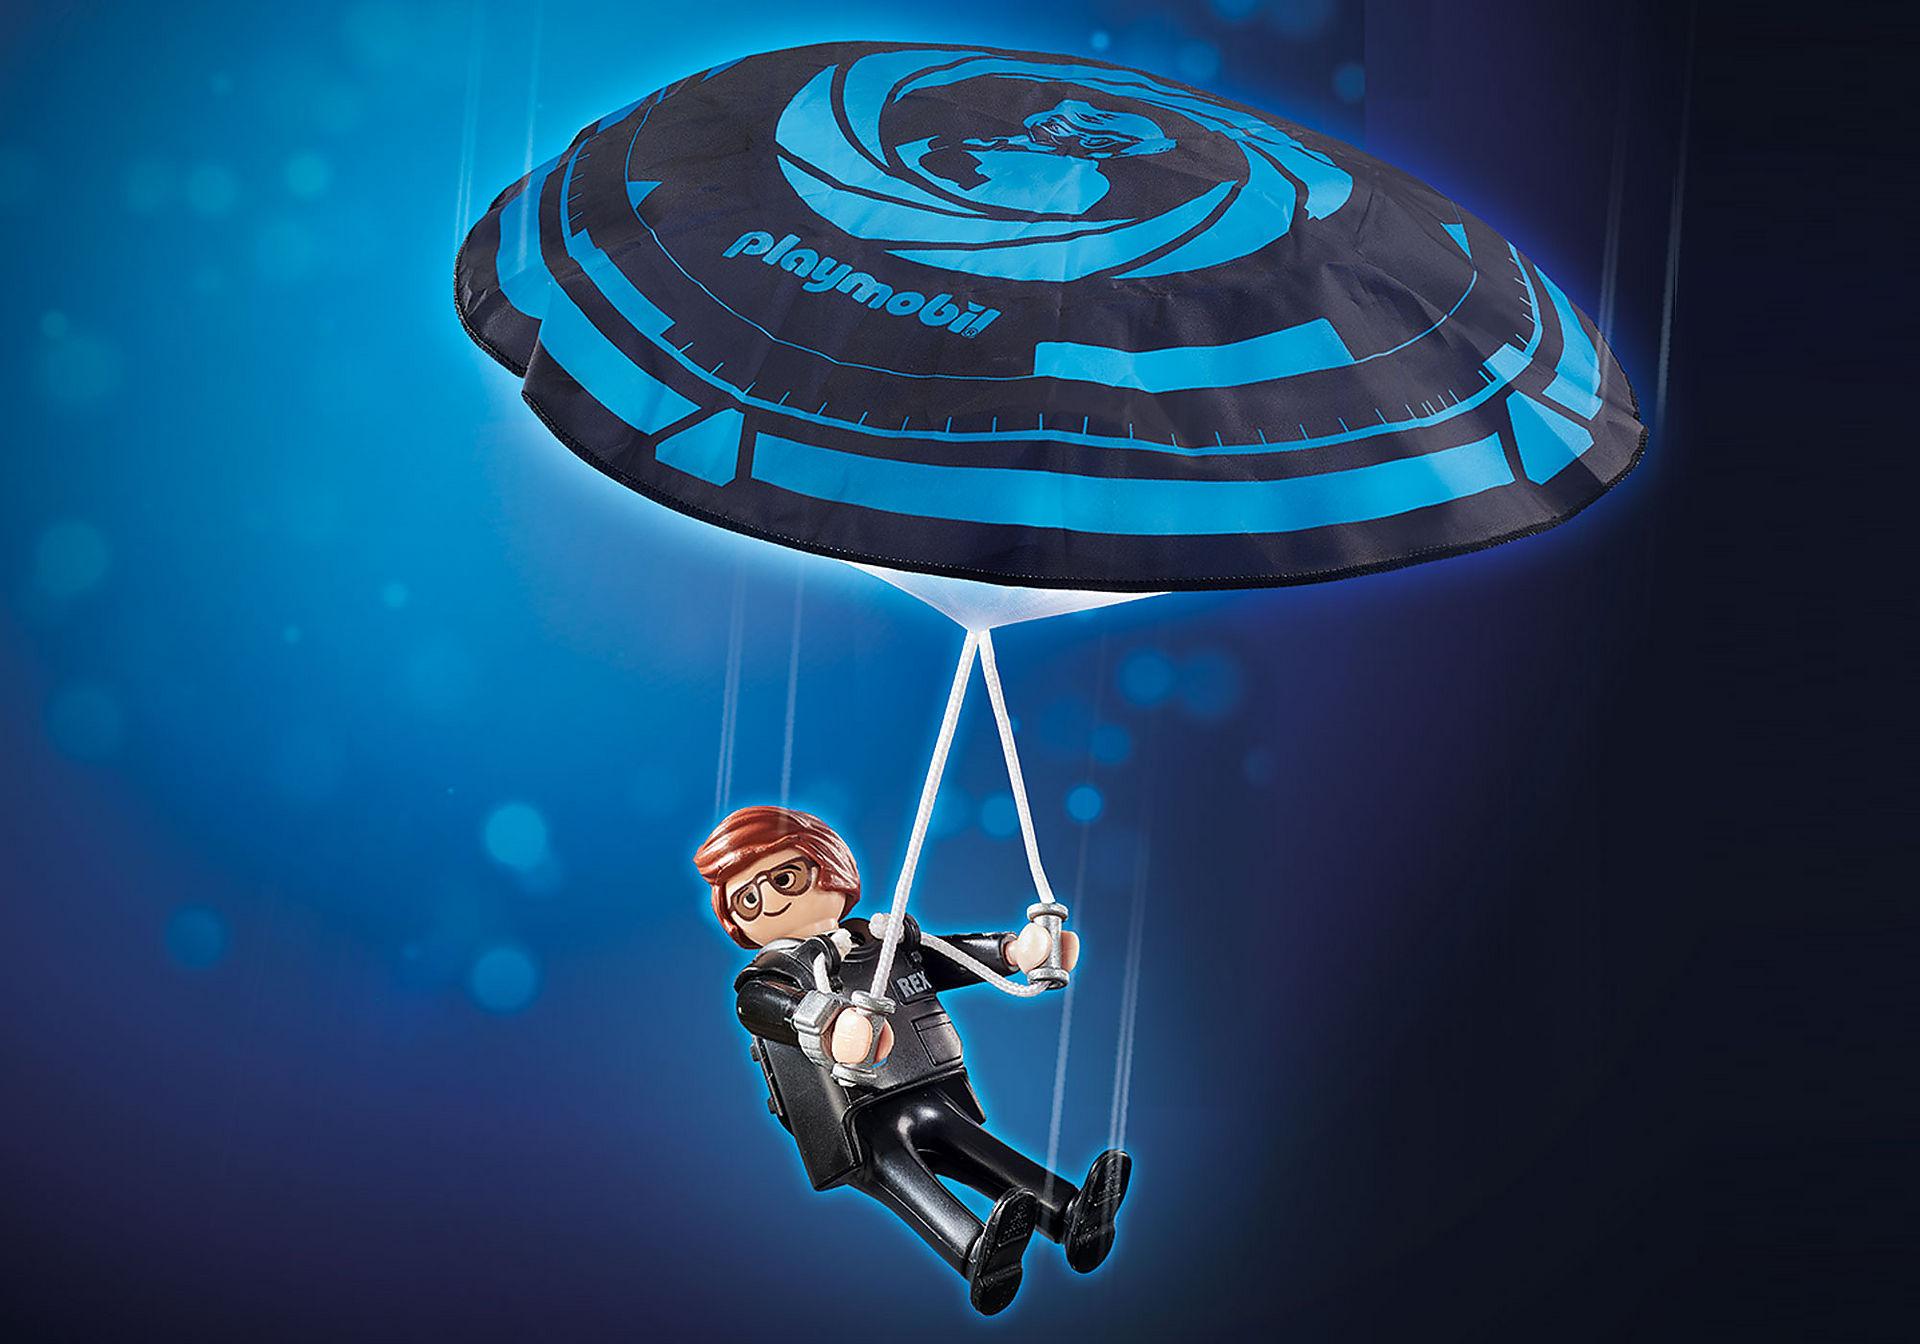 70070 PLAYMOBIL: THE MOVIE Rex Dasher avec parachute zoom image1